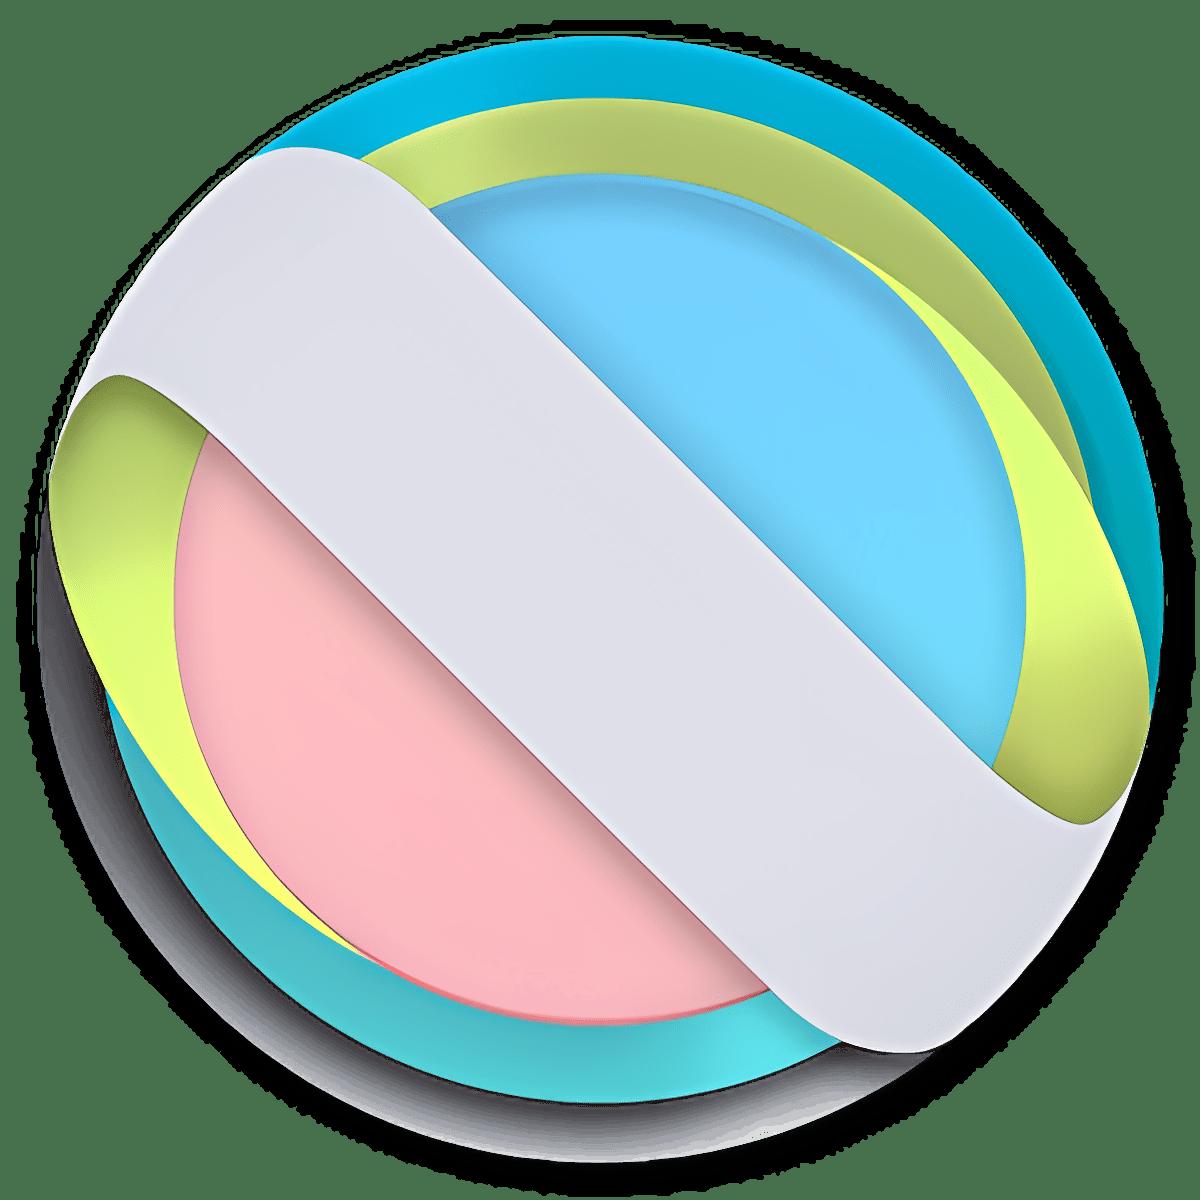 NOU - Icon Pack 1.8